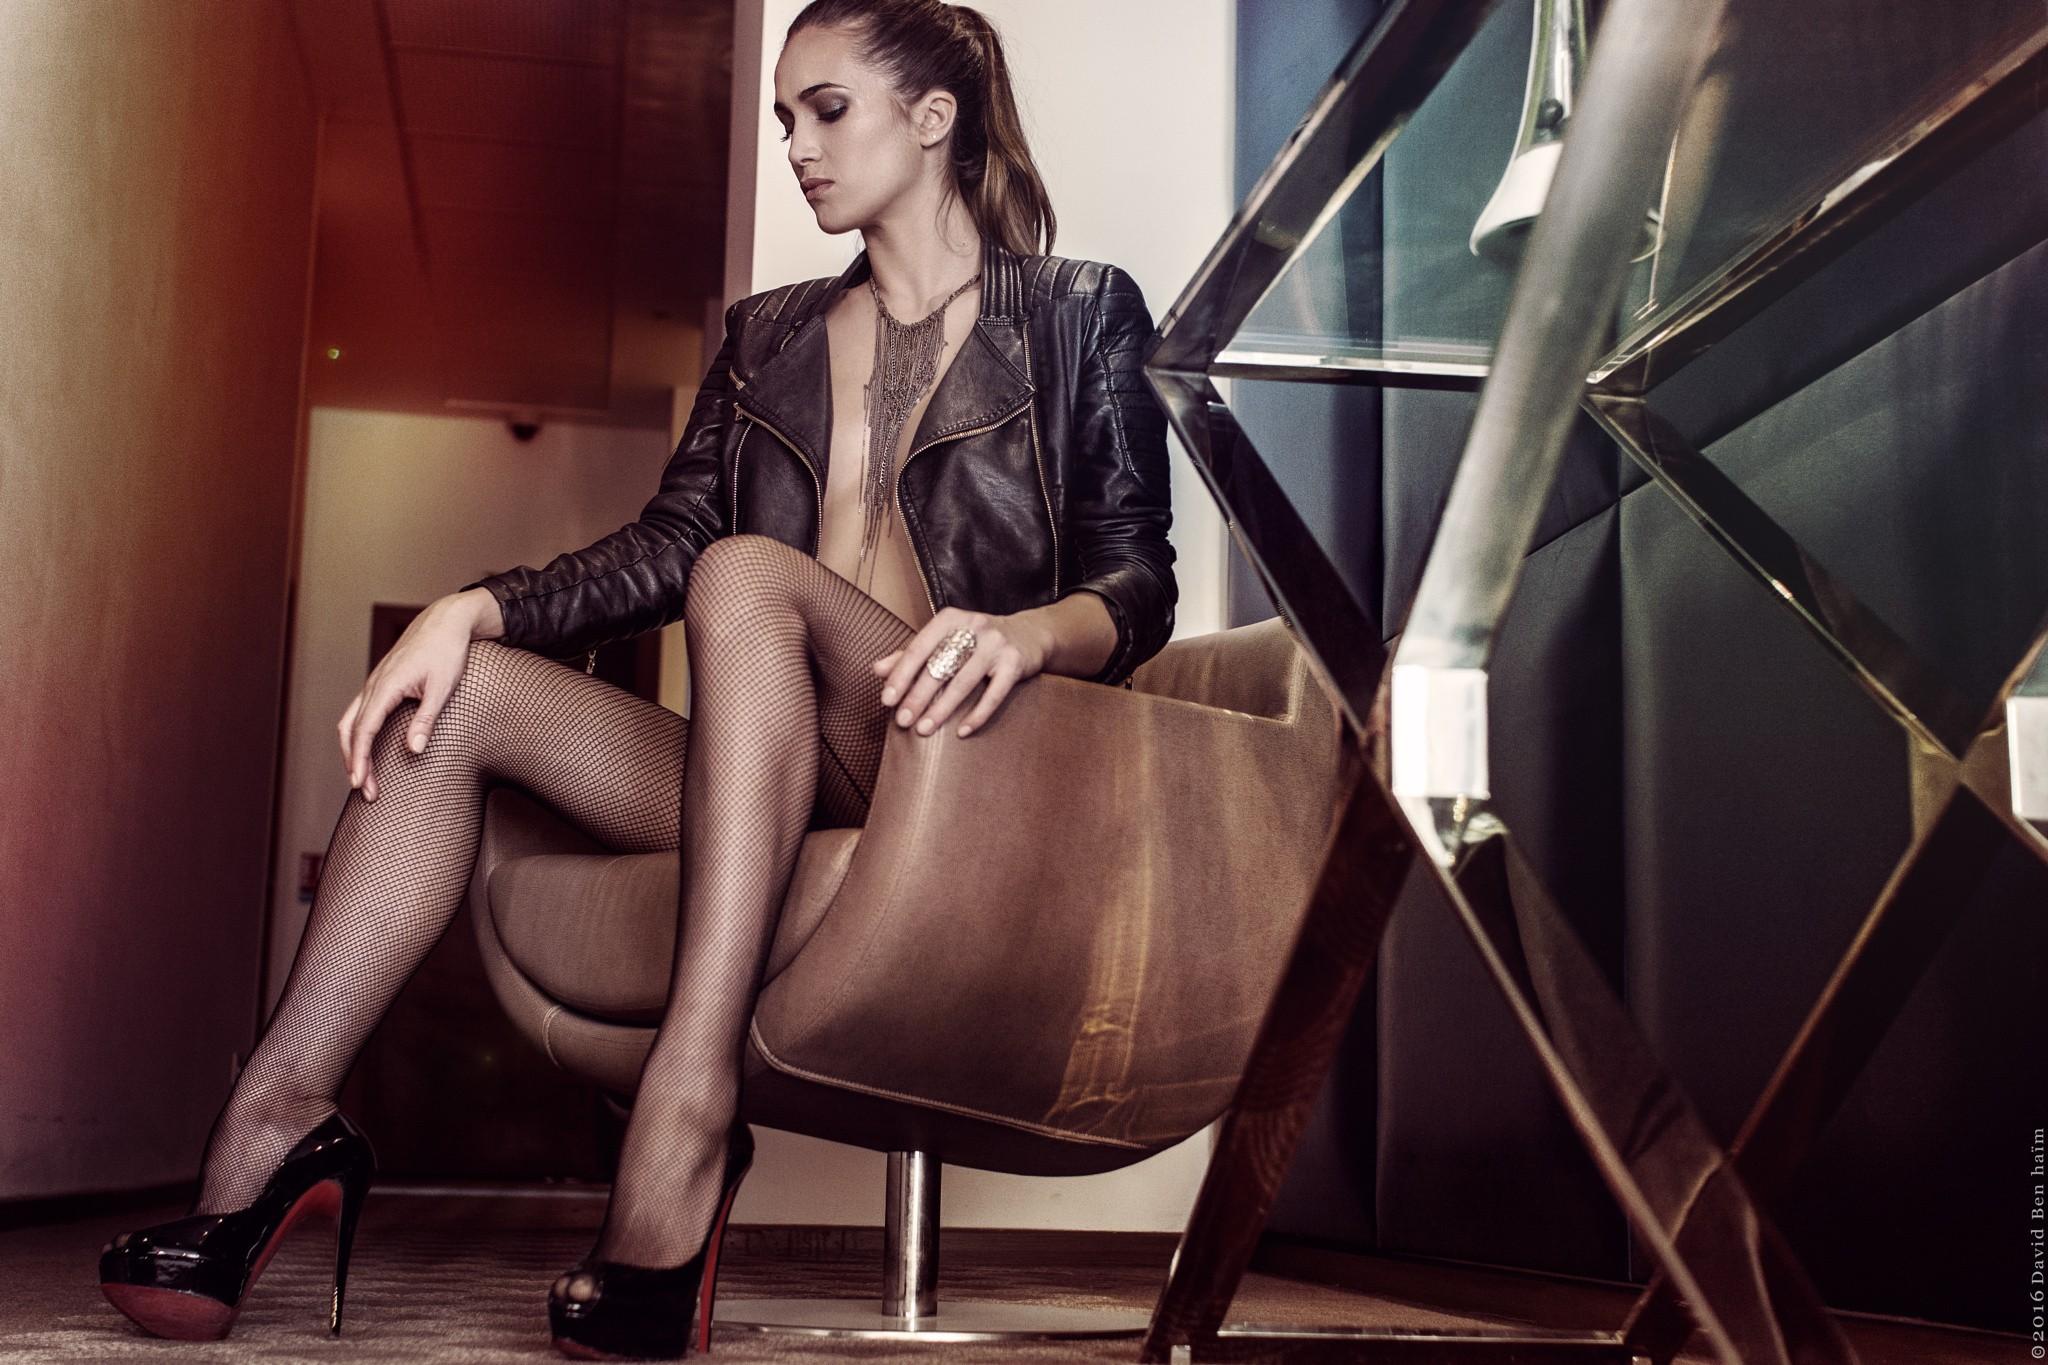 Wallpaper : women, model, brunette, sitting, high heels, necklace,  pantyhose, chair, leather jackets, fashion, no bra, David Ben Ha m, small  boobs, ...